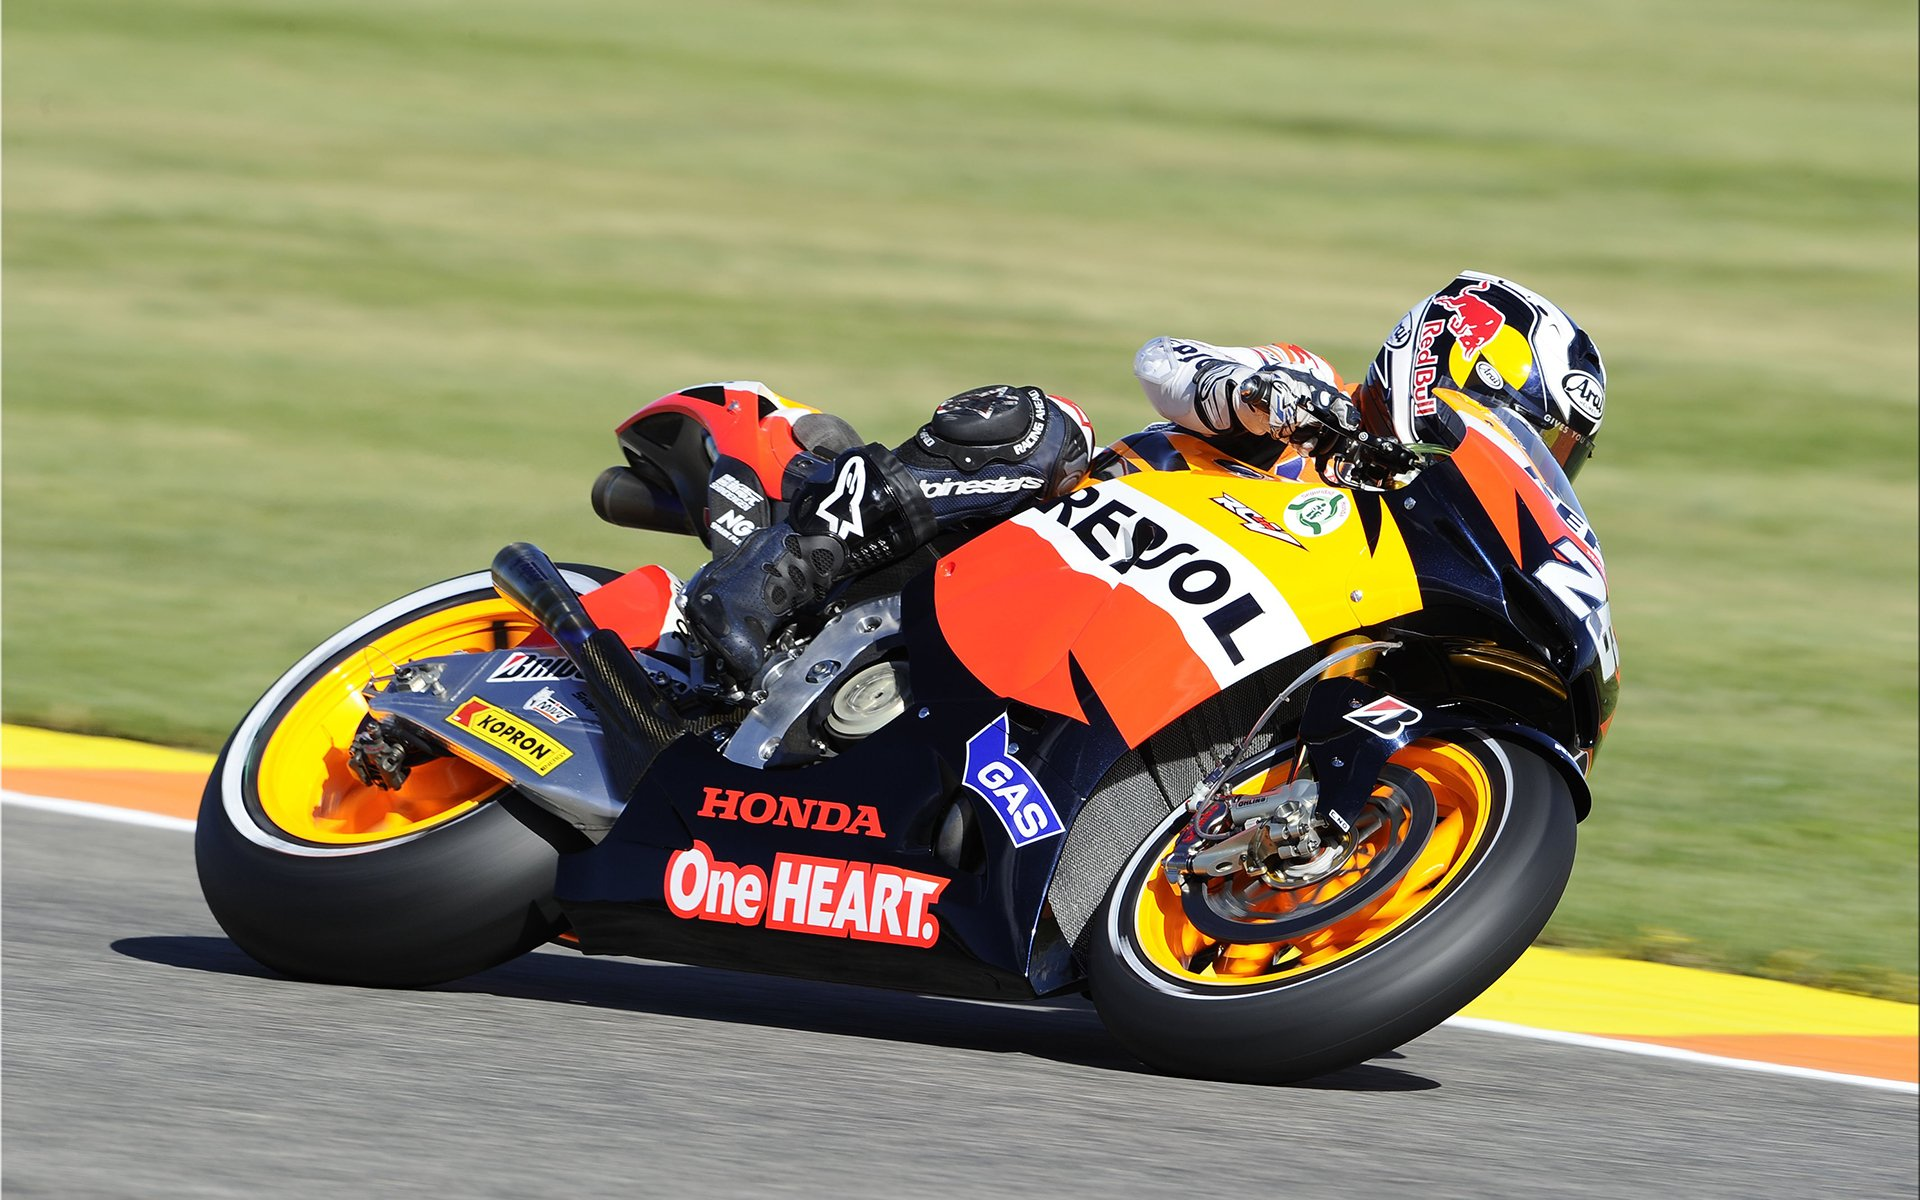 Sports - Motorcycle Racing  Motorcycle Sportsbike Racing Honda Cbr1000 Wallpaper